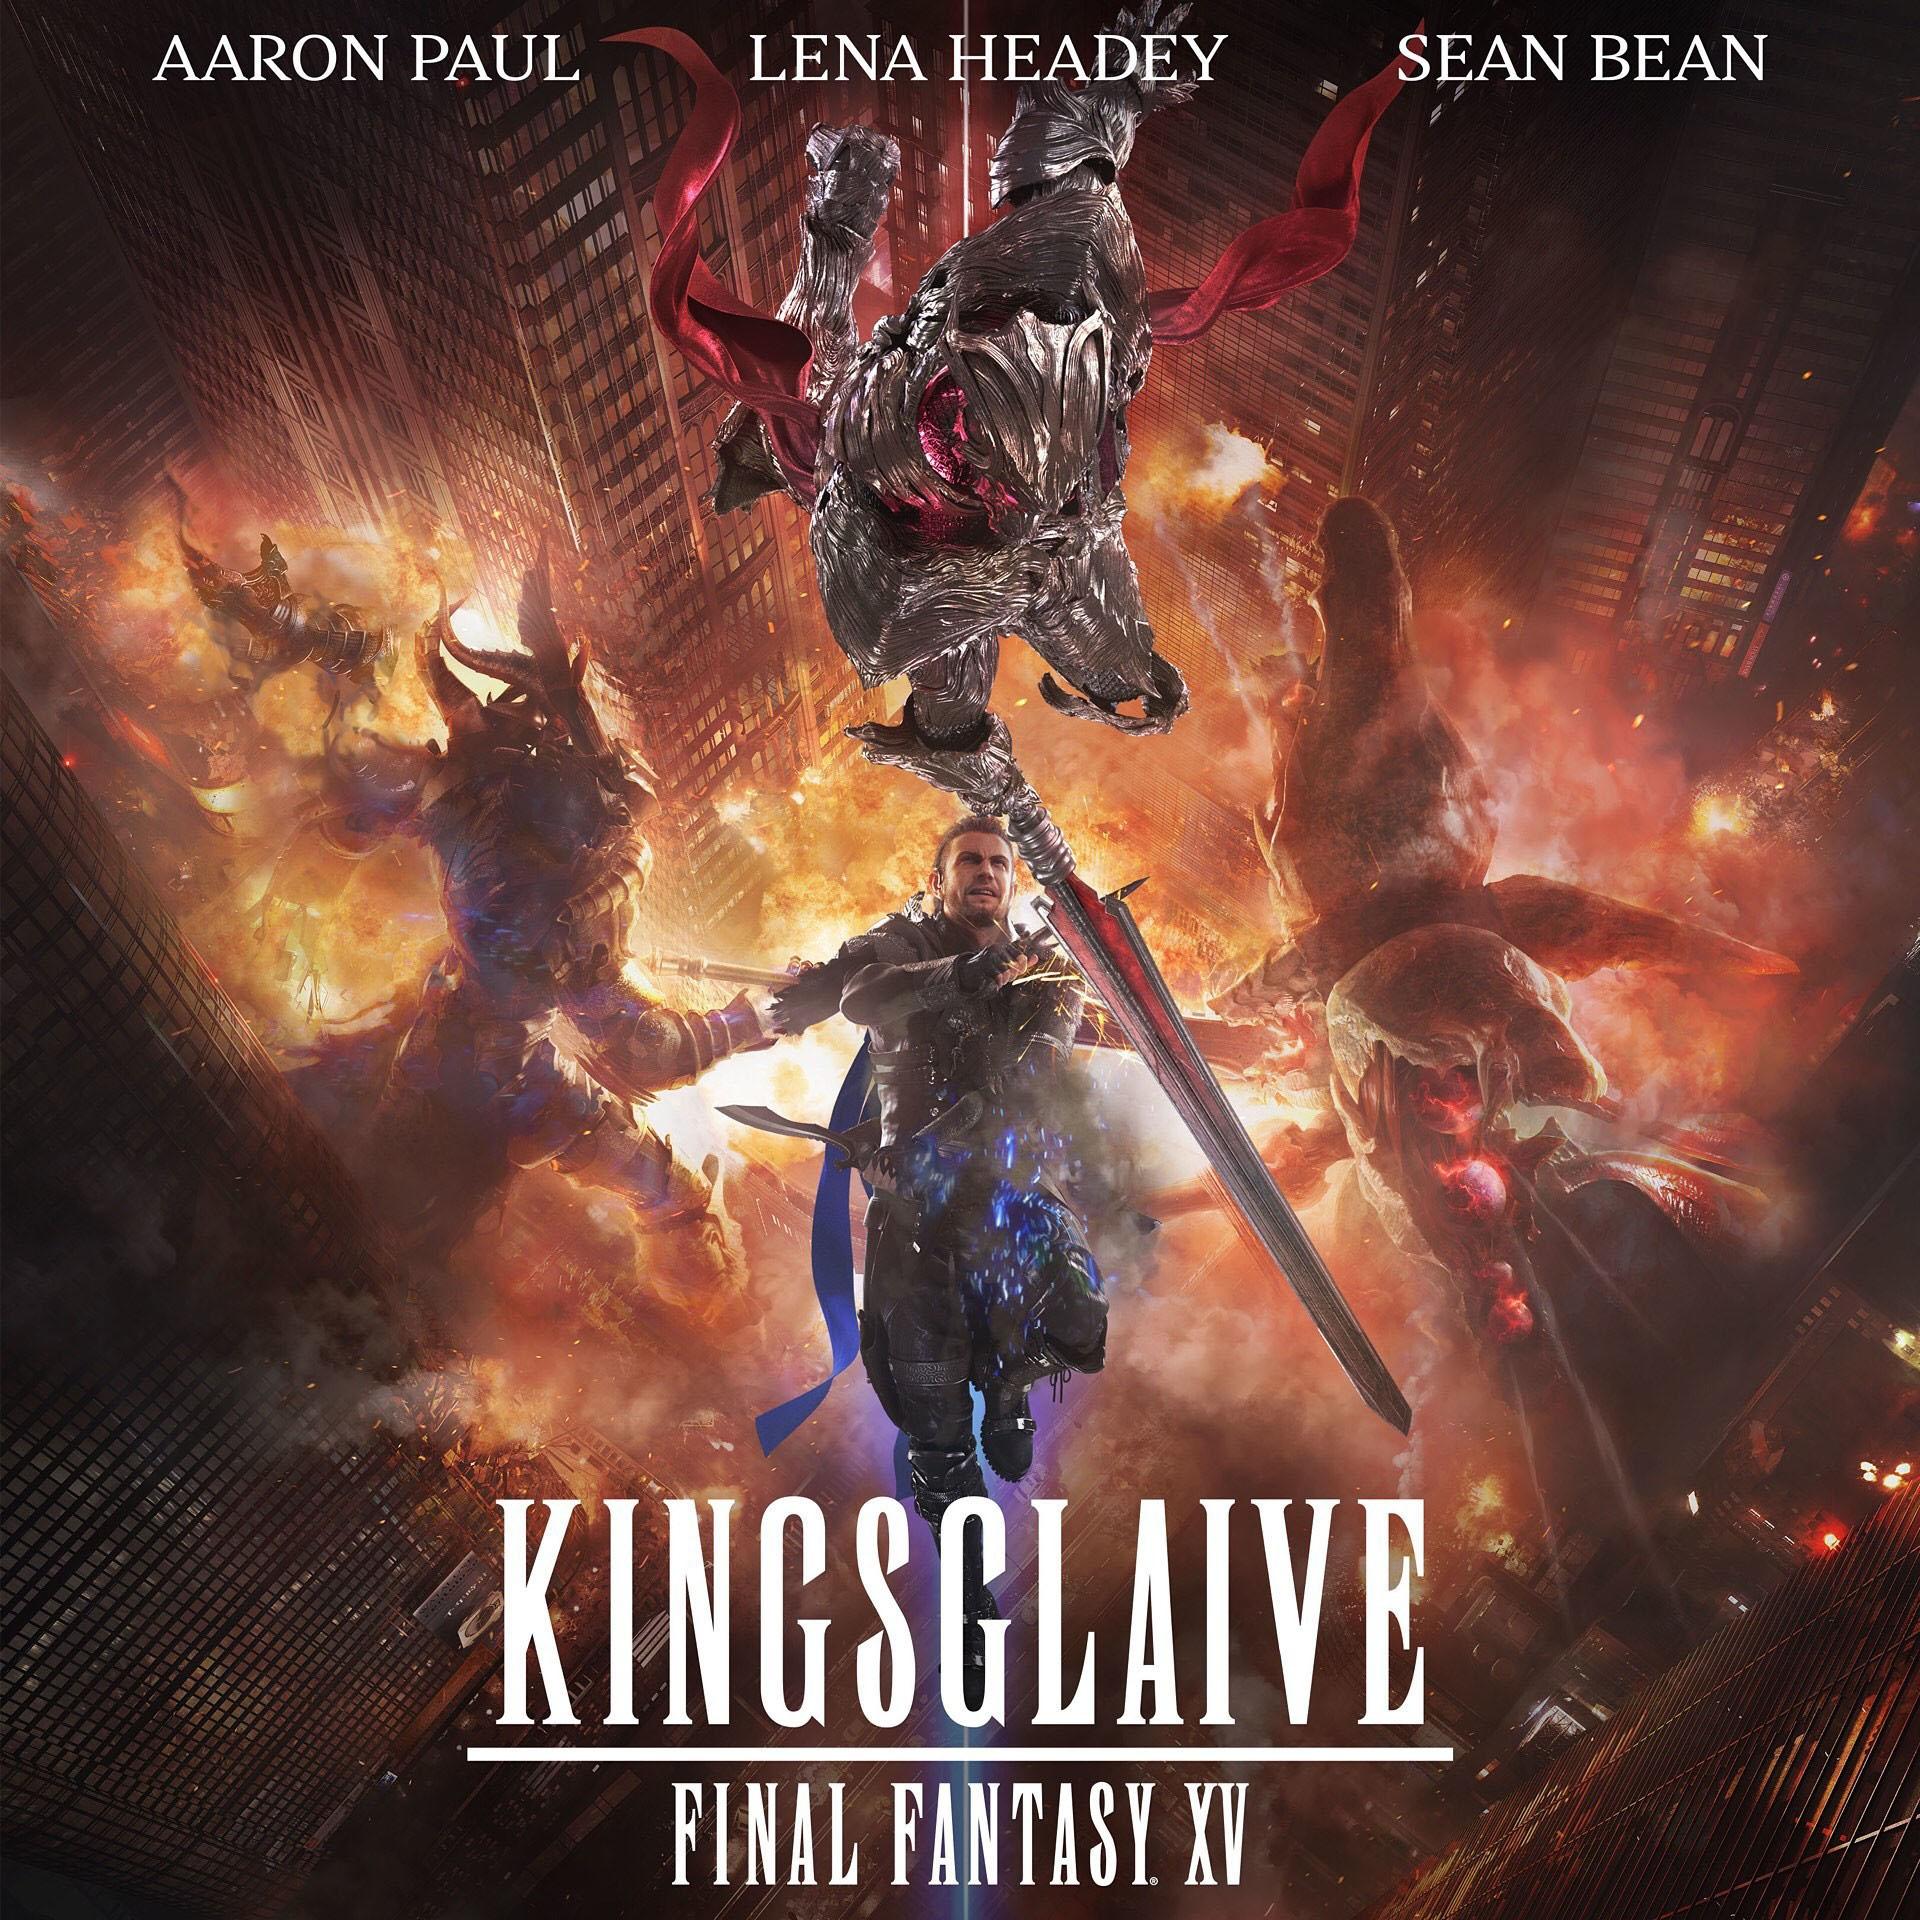 kingsglaive-final-fantasy-xv-new-poster